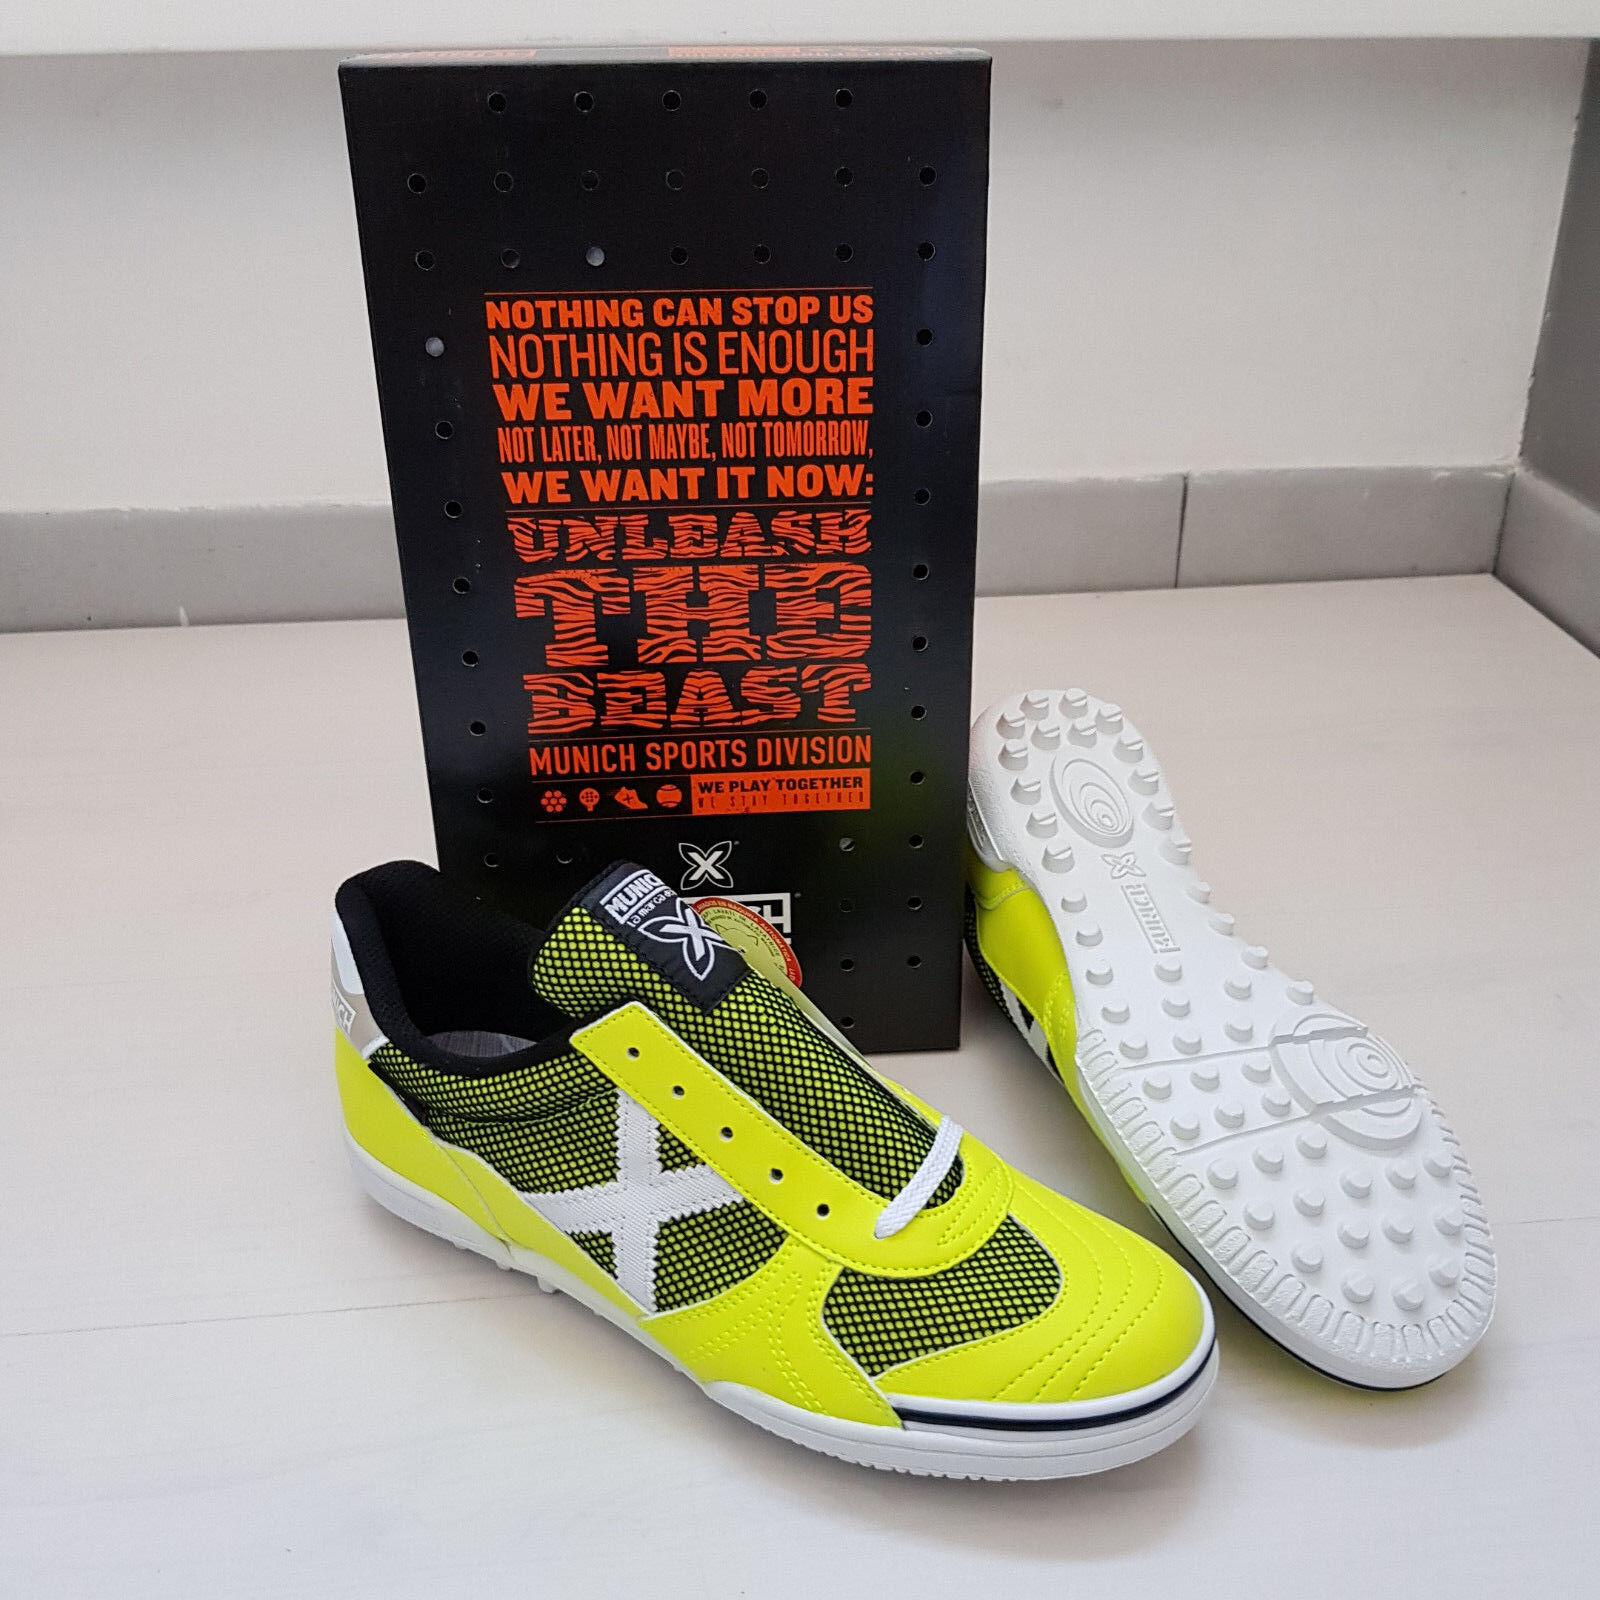 M57 MUNICH G3 GENIUS OUTDOOR CALCETTO Schuhe ESTERNO SCARPINI Schuhe CALCETTO Schuhe FLUO 3013020 f77dd7